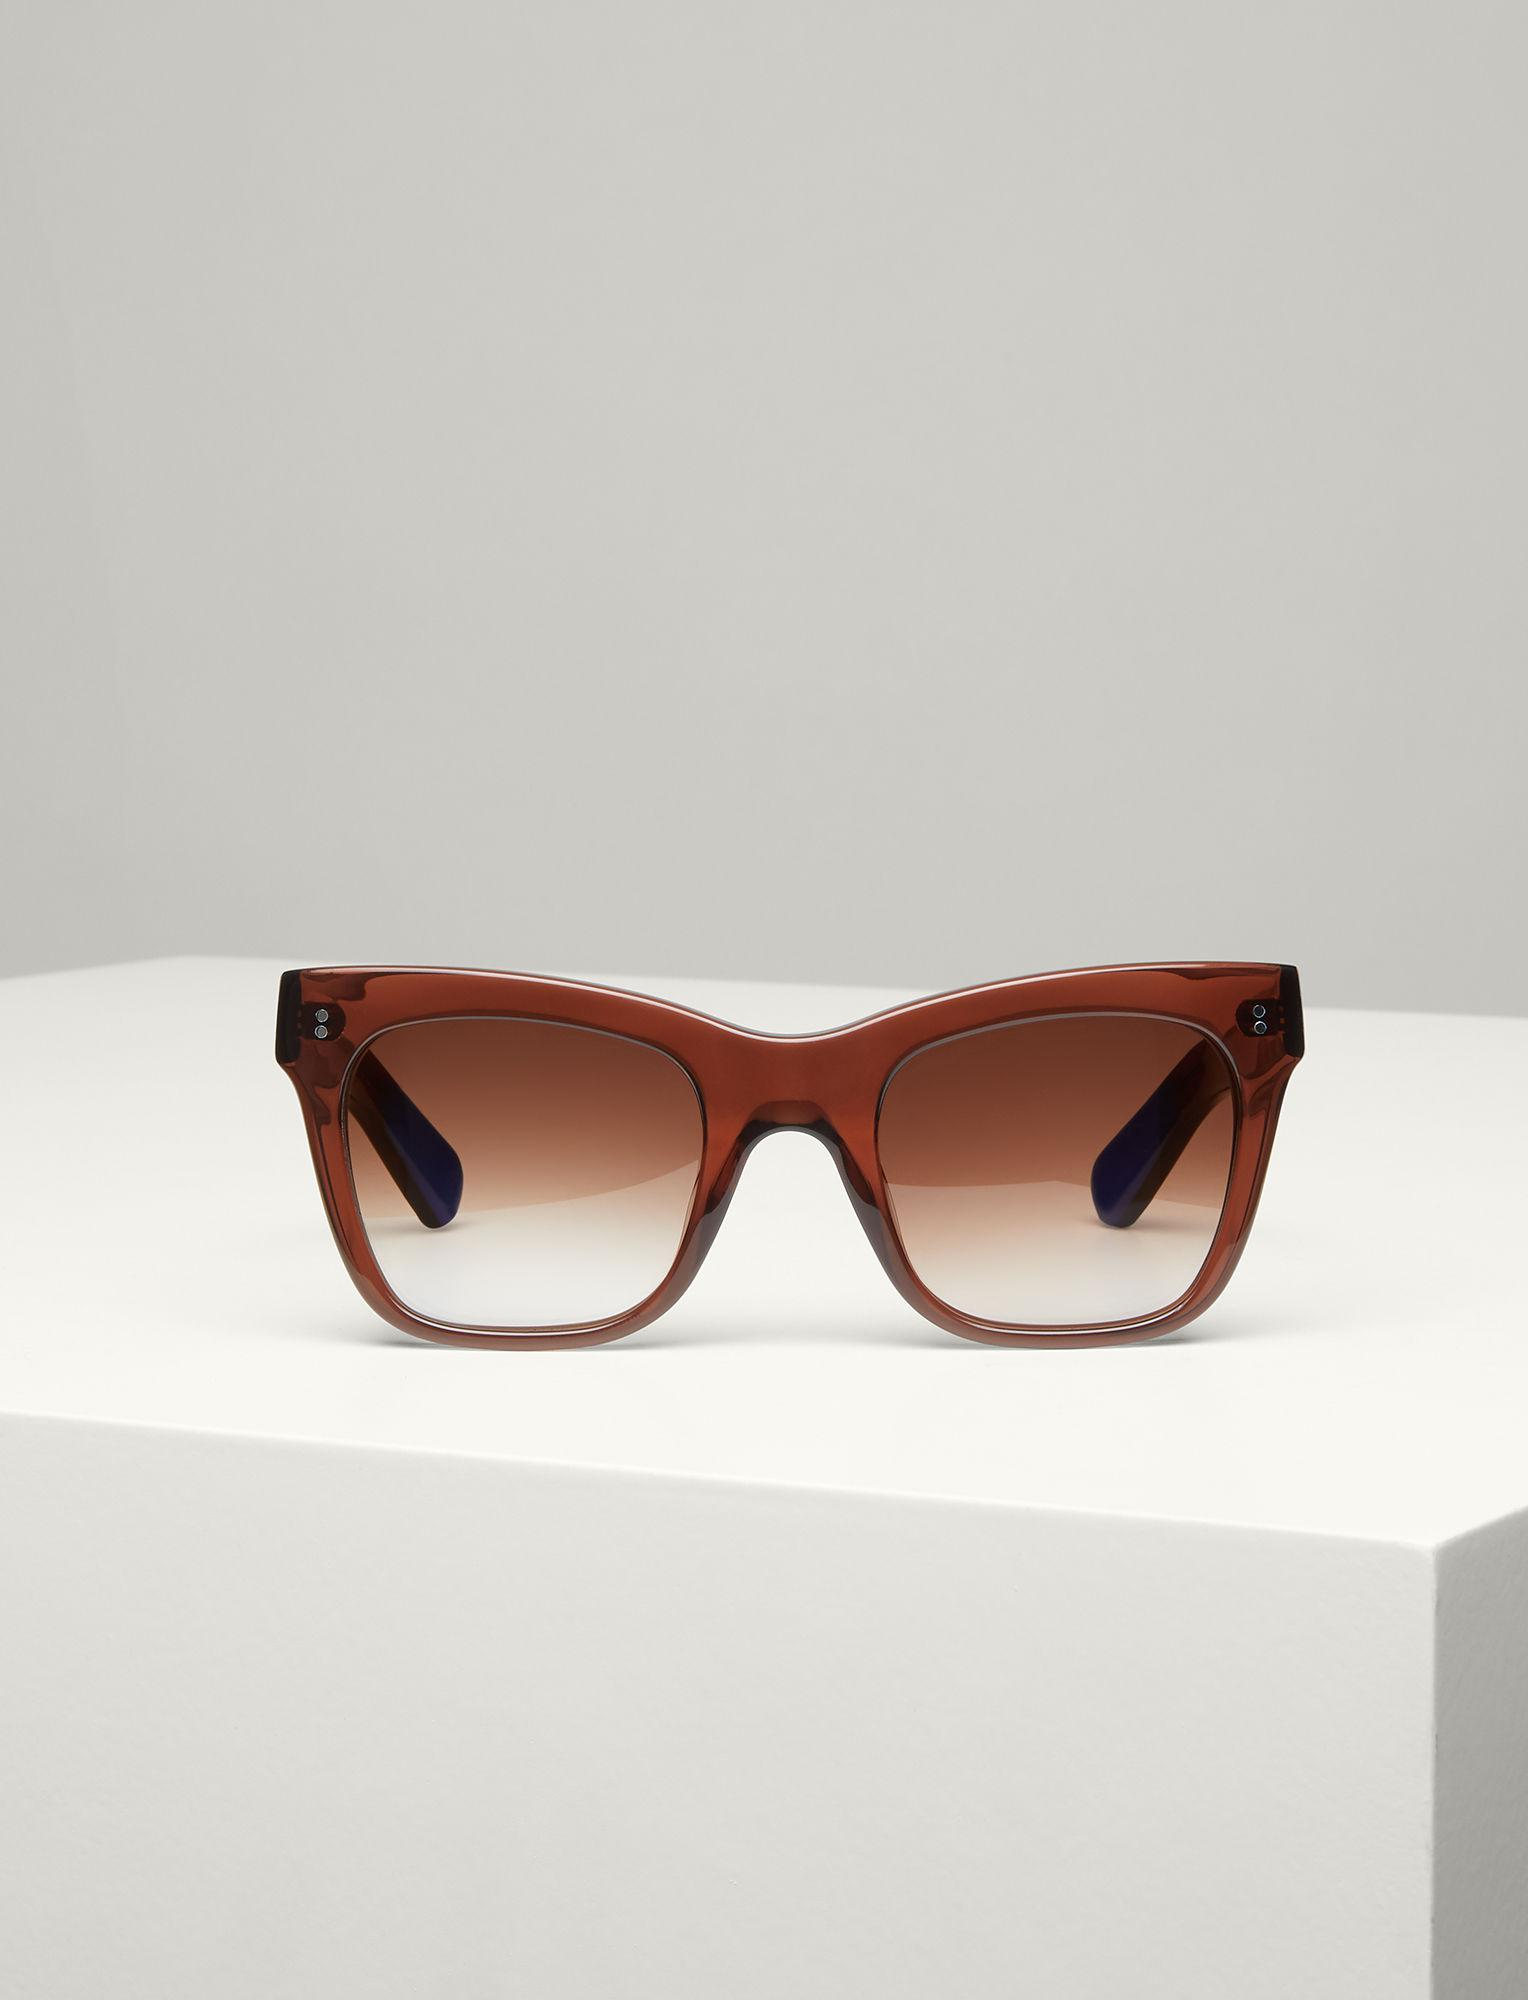 Germain sunglasses - Nude & Neutrals Joseph RGikYWEItk